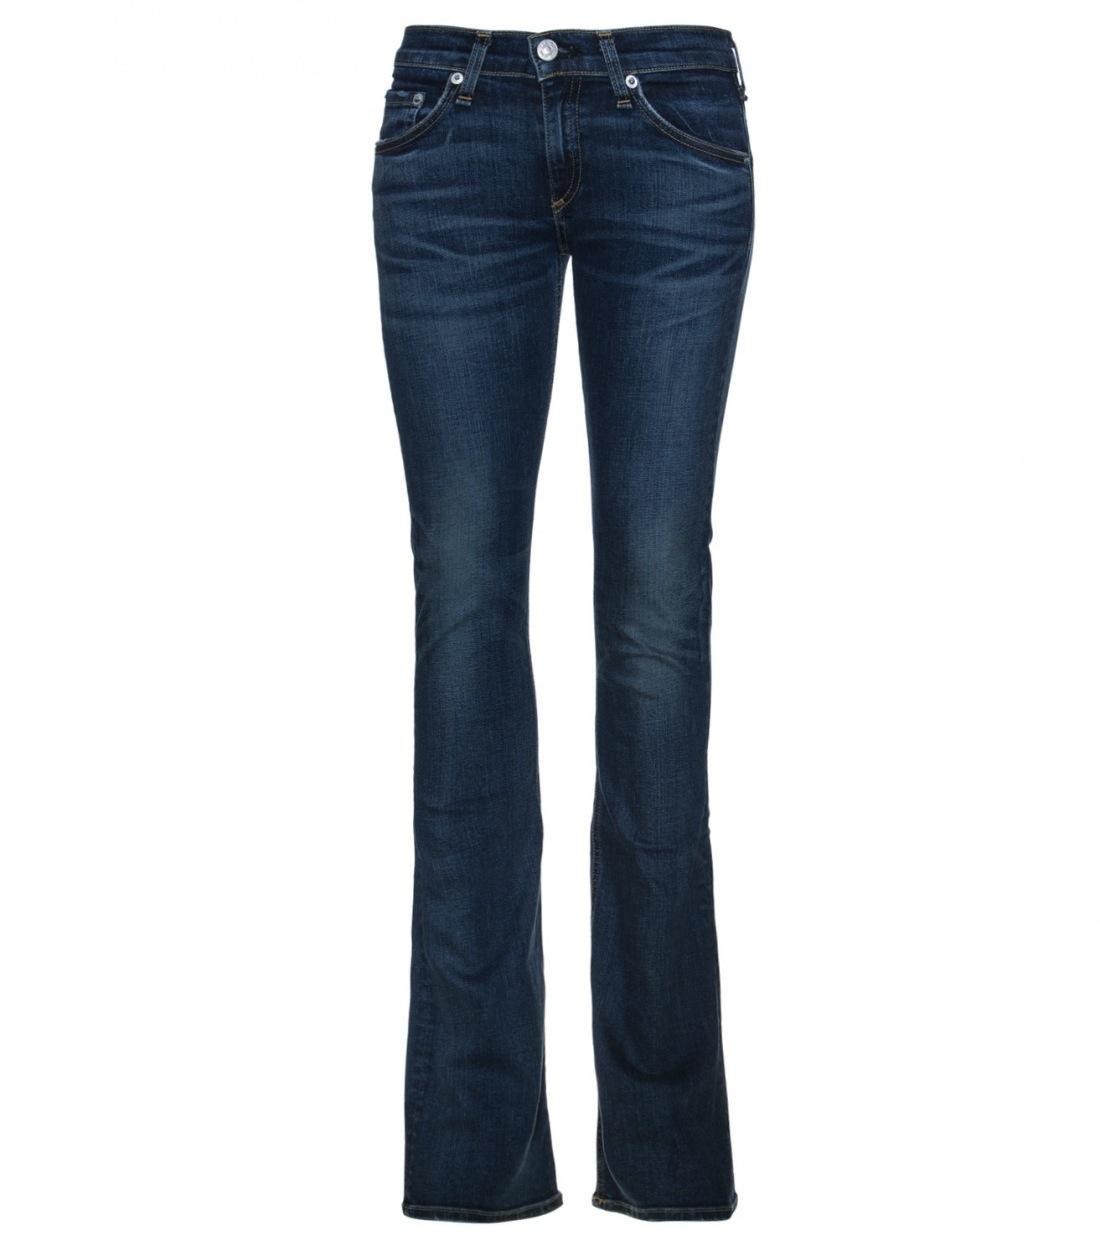 rag-bone bootcut mid rise jeans bishop